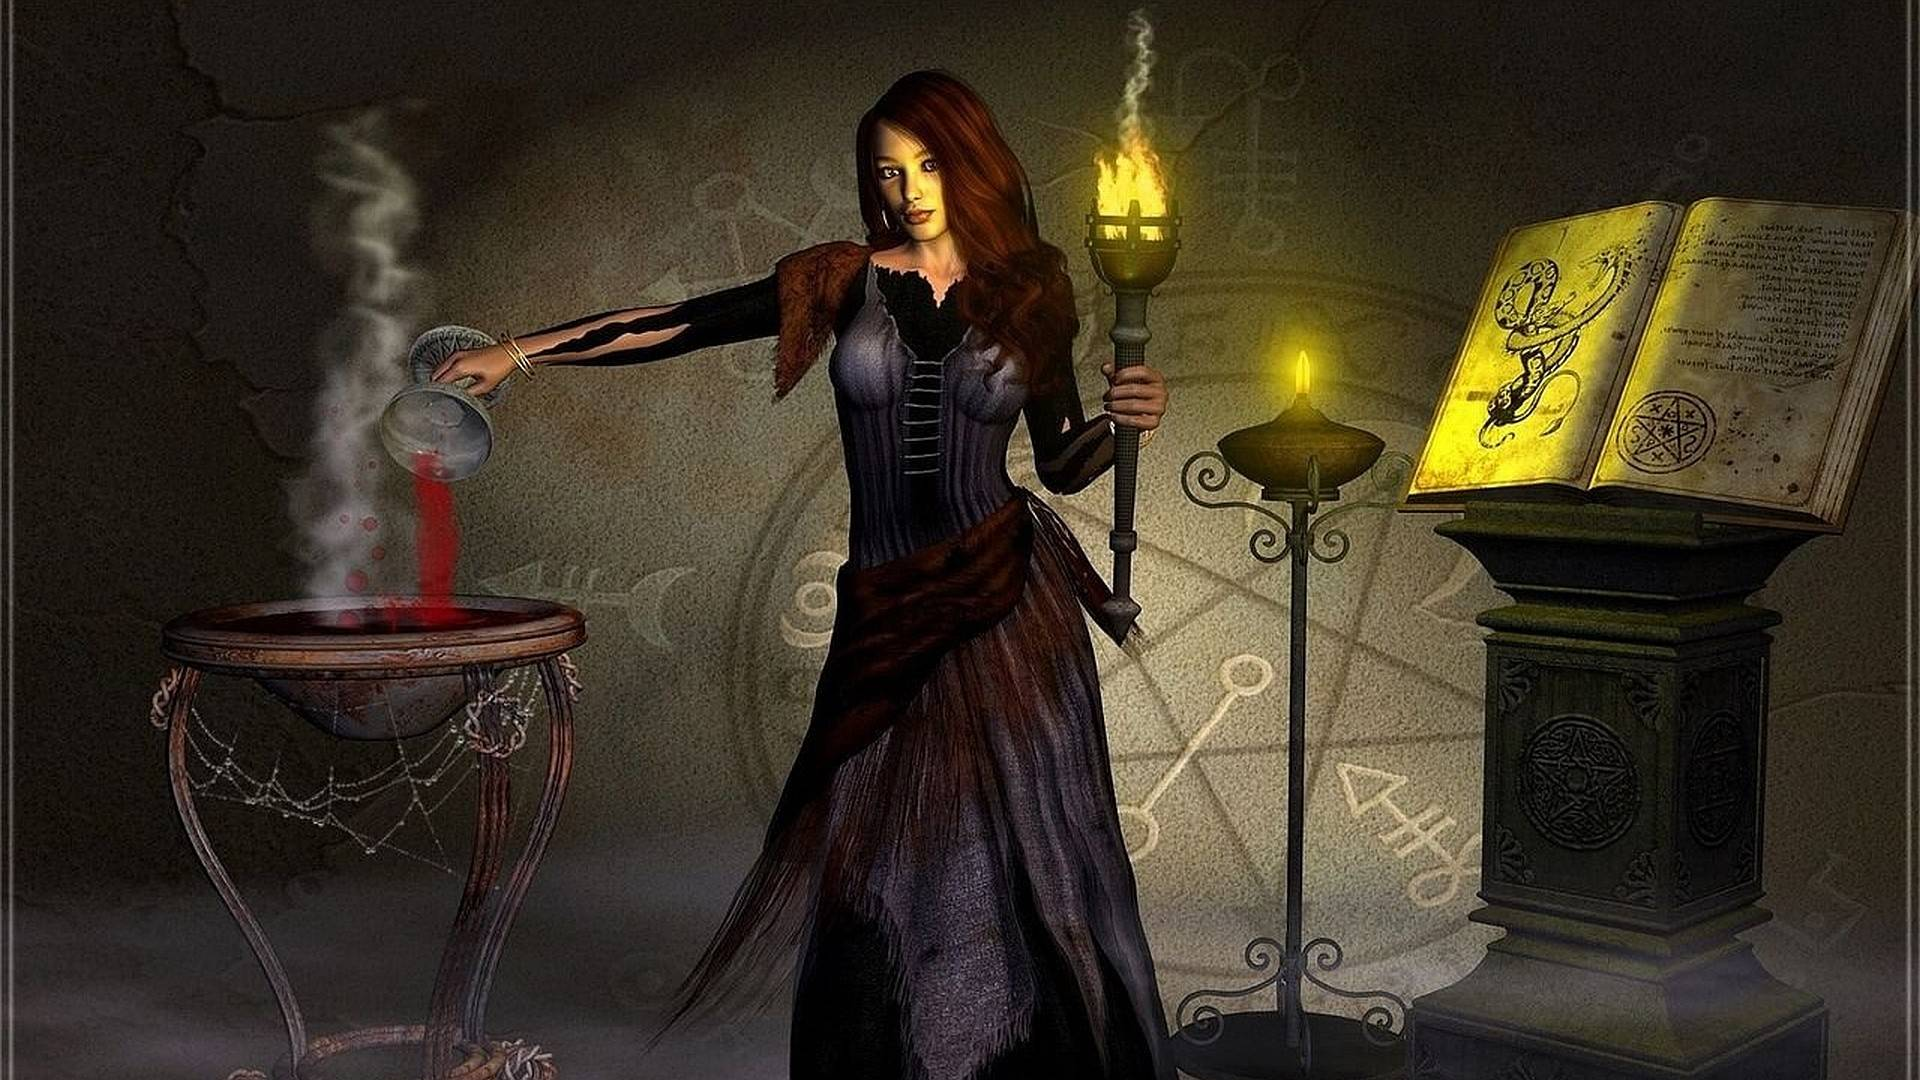 Заговор на неудачу: варианты ритуалов на невезение